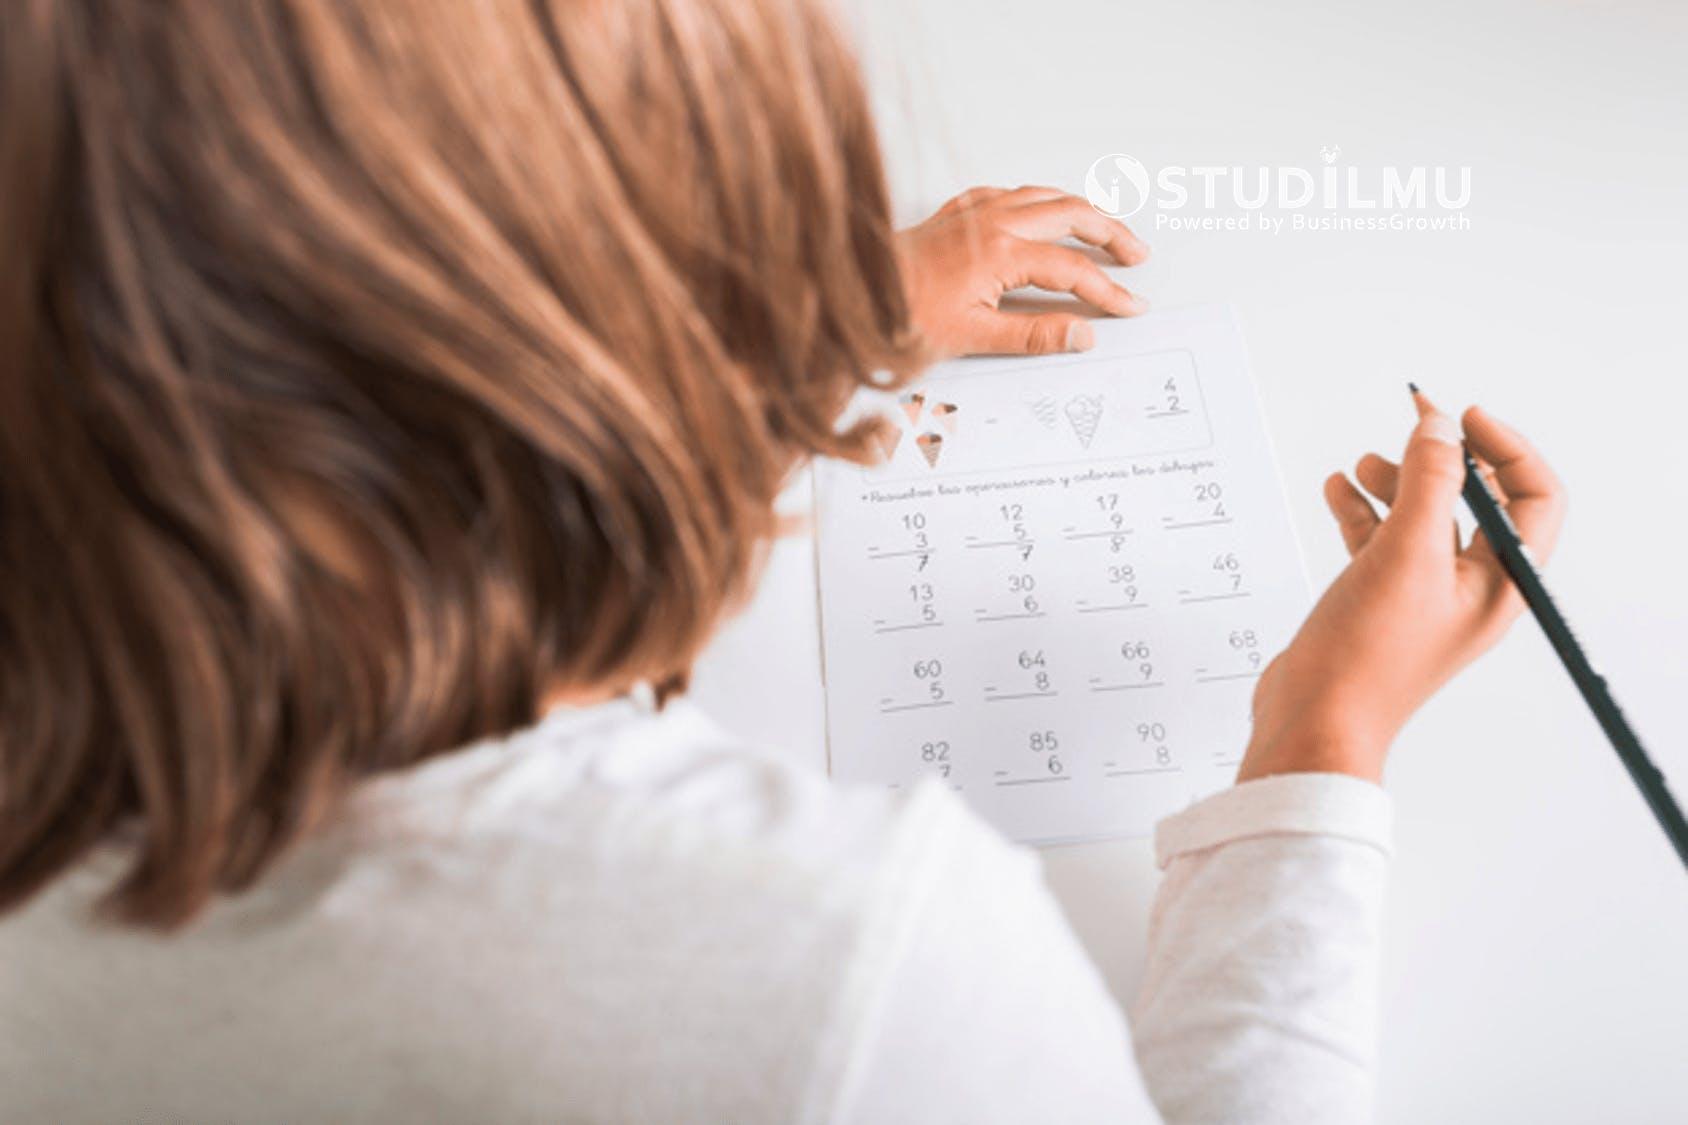 STUDILMU Career Advice - 7 Tips Sukses Menyelesaikan Pekerjaan Sesuai Tenggat Waktu